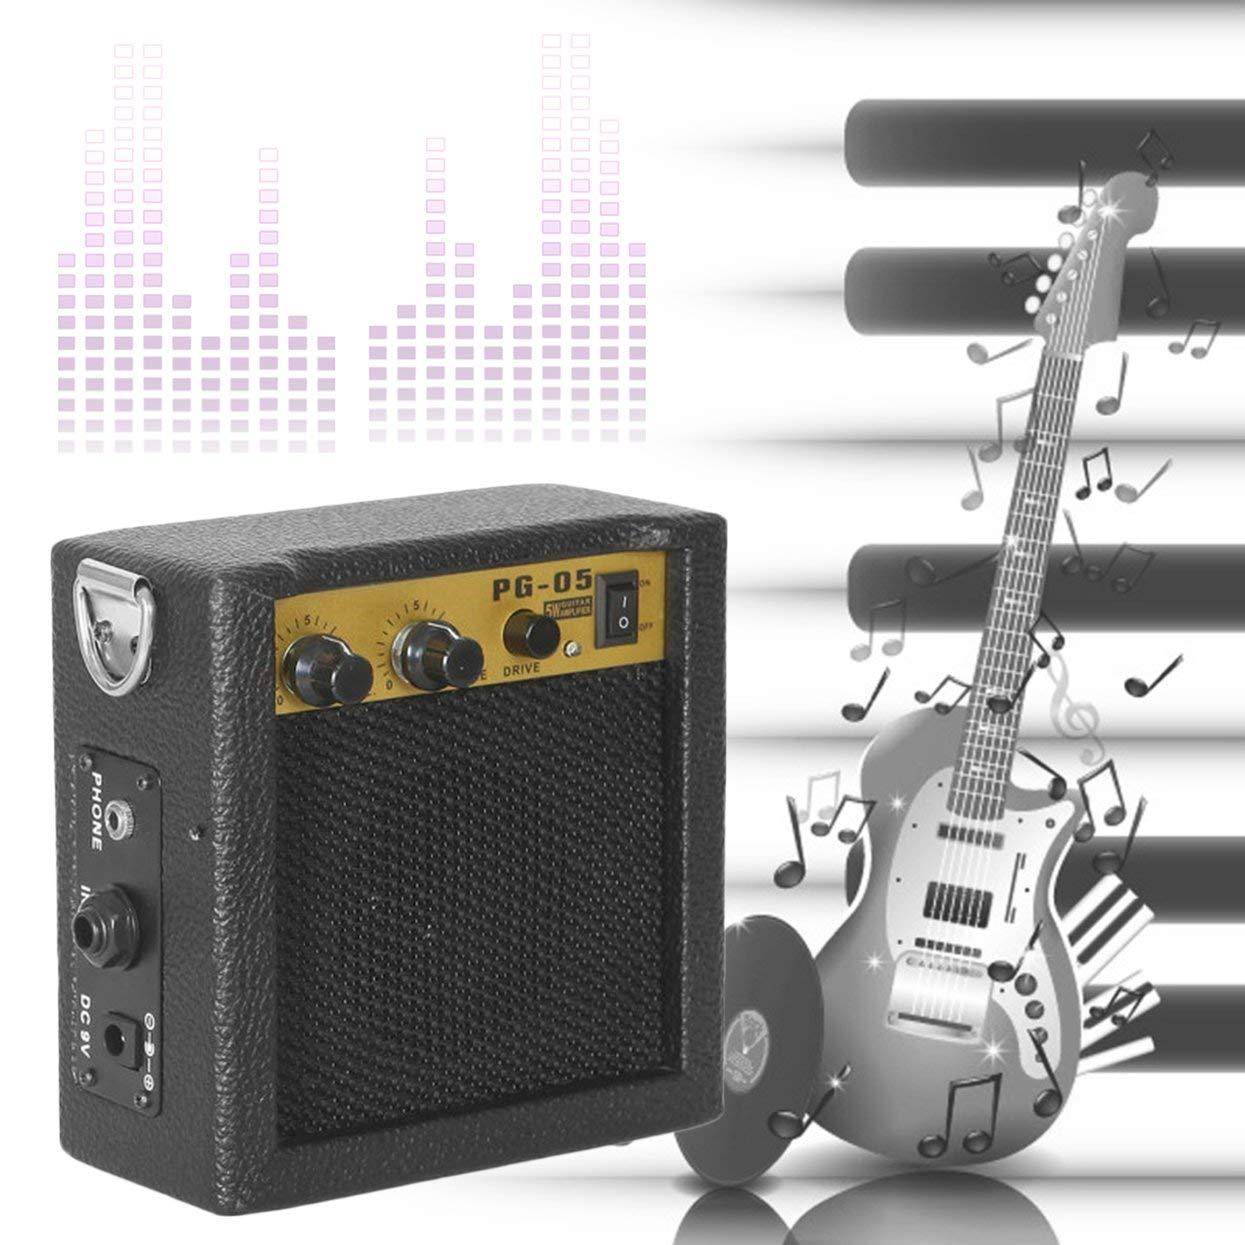 Amplificador de guitarra, amplificador de guitarra, E-WAVE PG-05 5W Mini amplificador de guitarra, amplificador de guitarra con 3 pulgadas de altavoz, ...